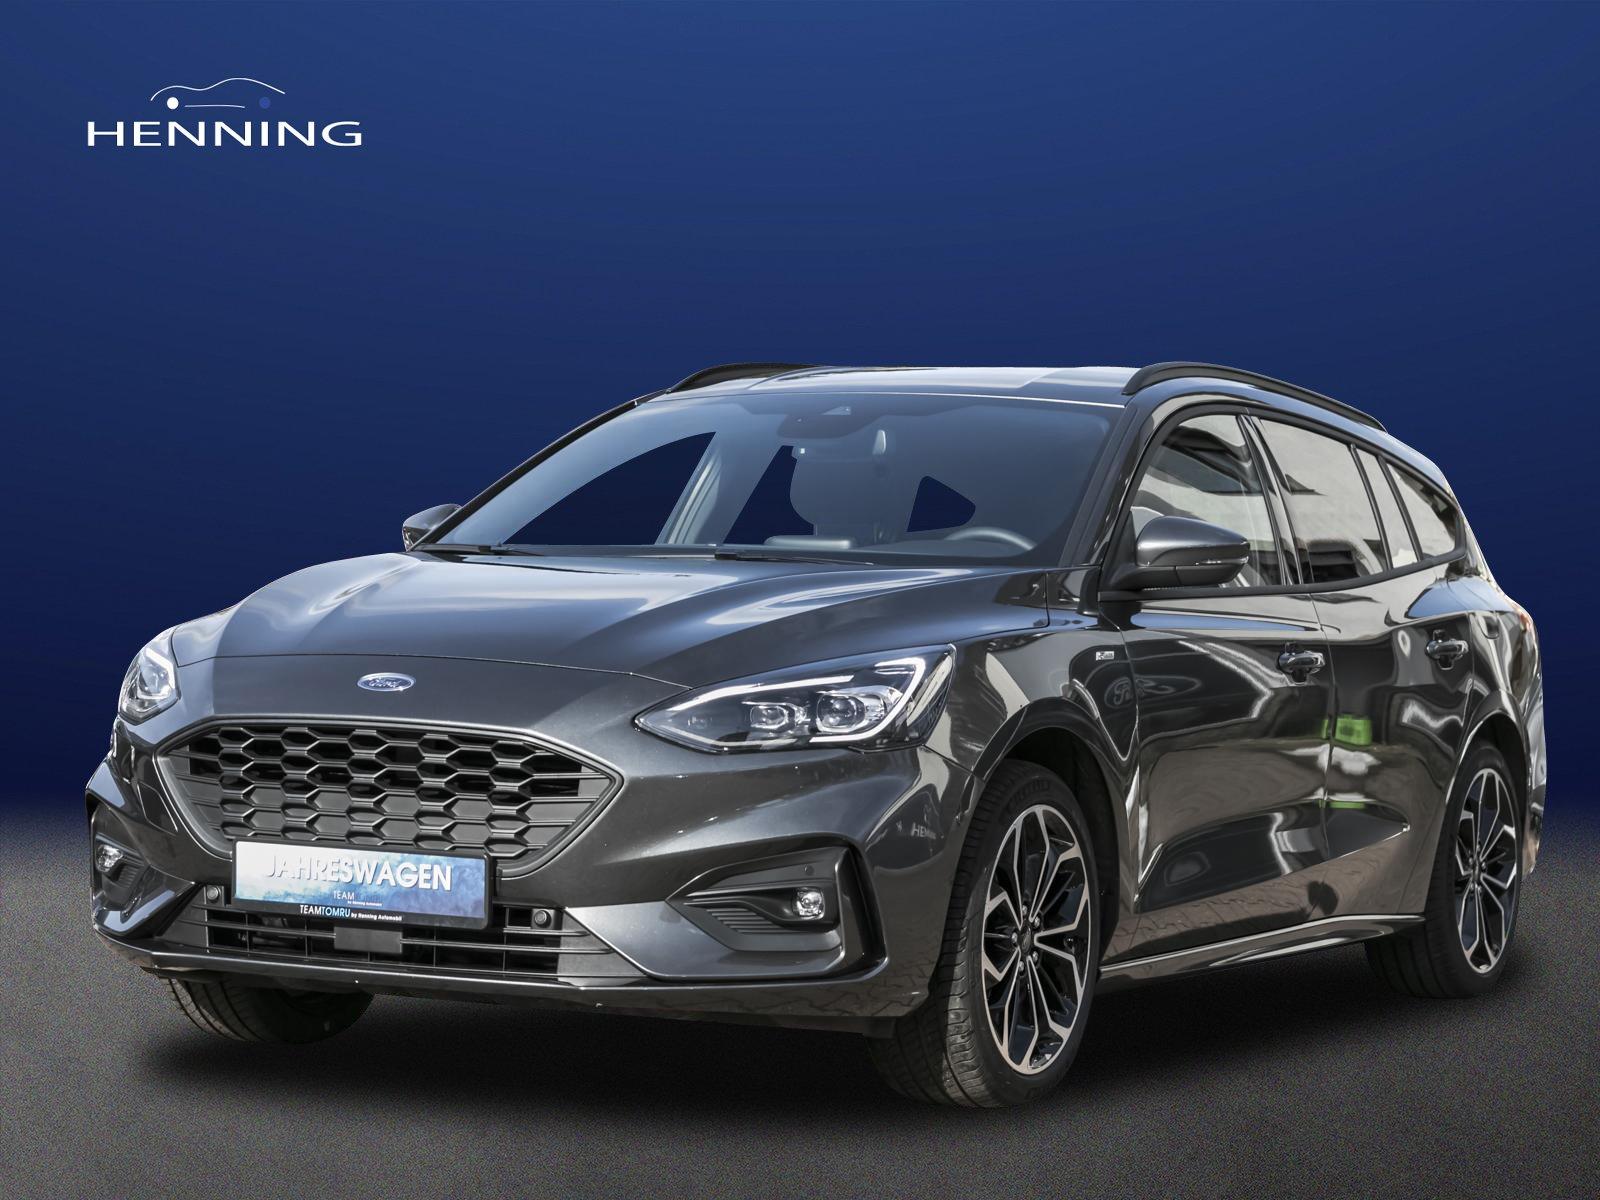 Ford Focus 1.5 EcoBoost ST-Line 18 Zoll*ACC*Fahrasiss, Jahr 2020, Benzin